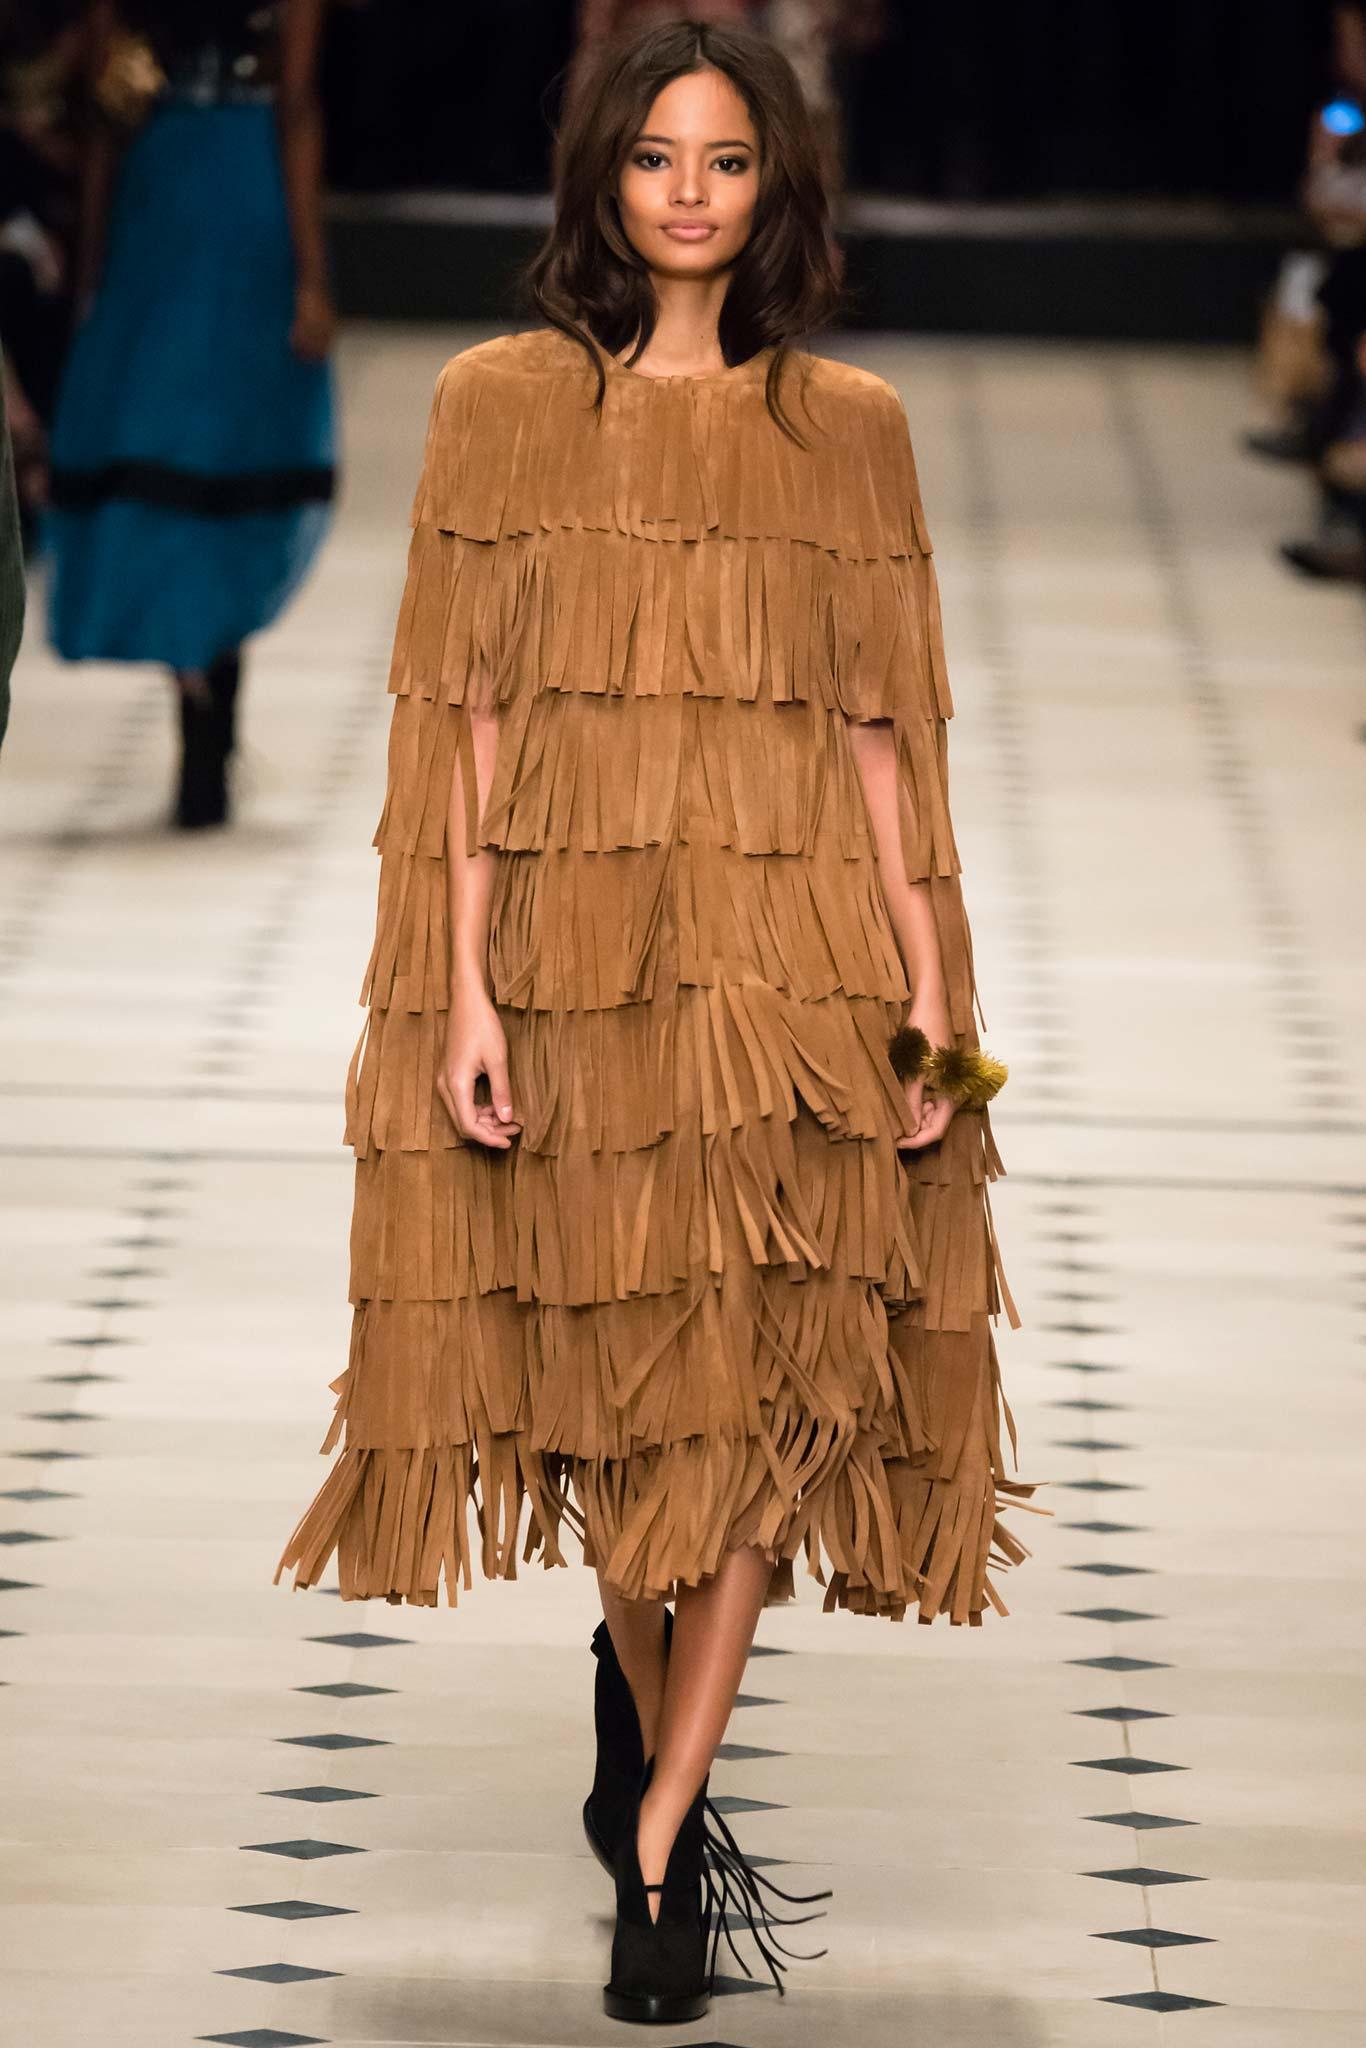 Burberry Prorsum| London Fashion Week Fall 2015 RTW